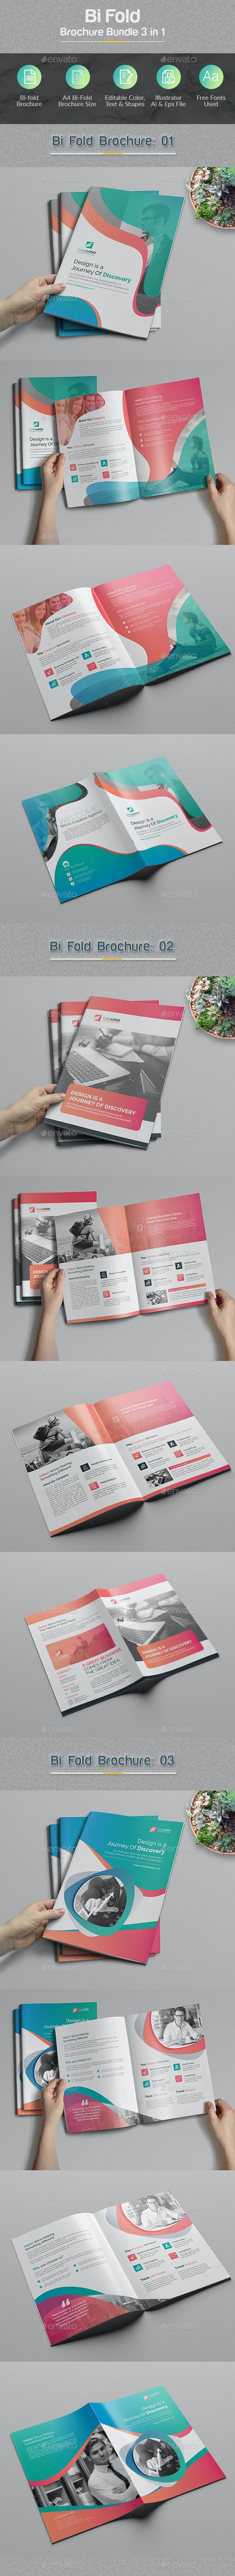 Bi-fold Brochure Bundle 3 in 1 - Corporate Brochures